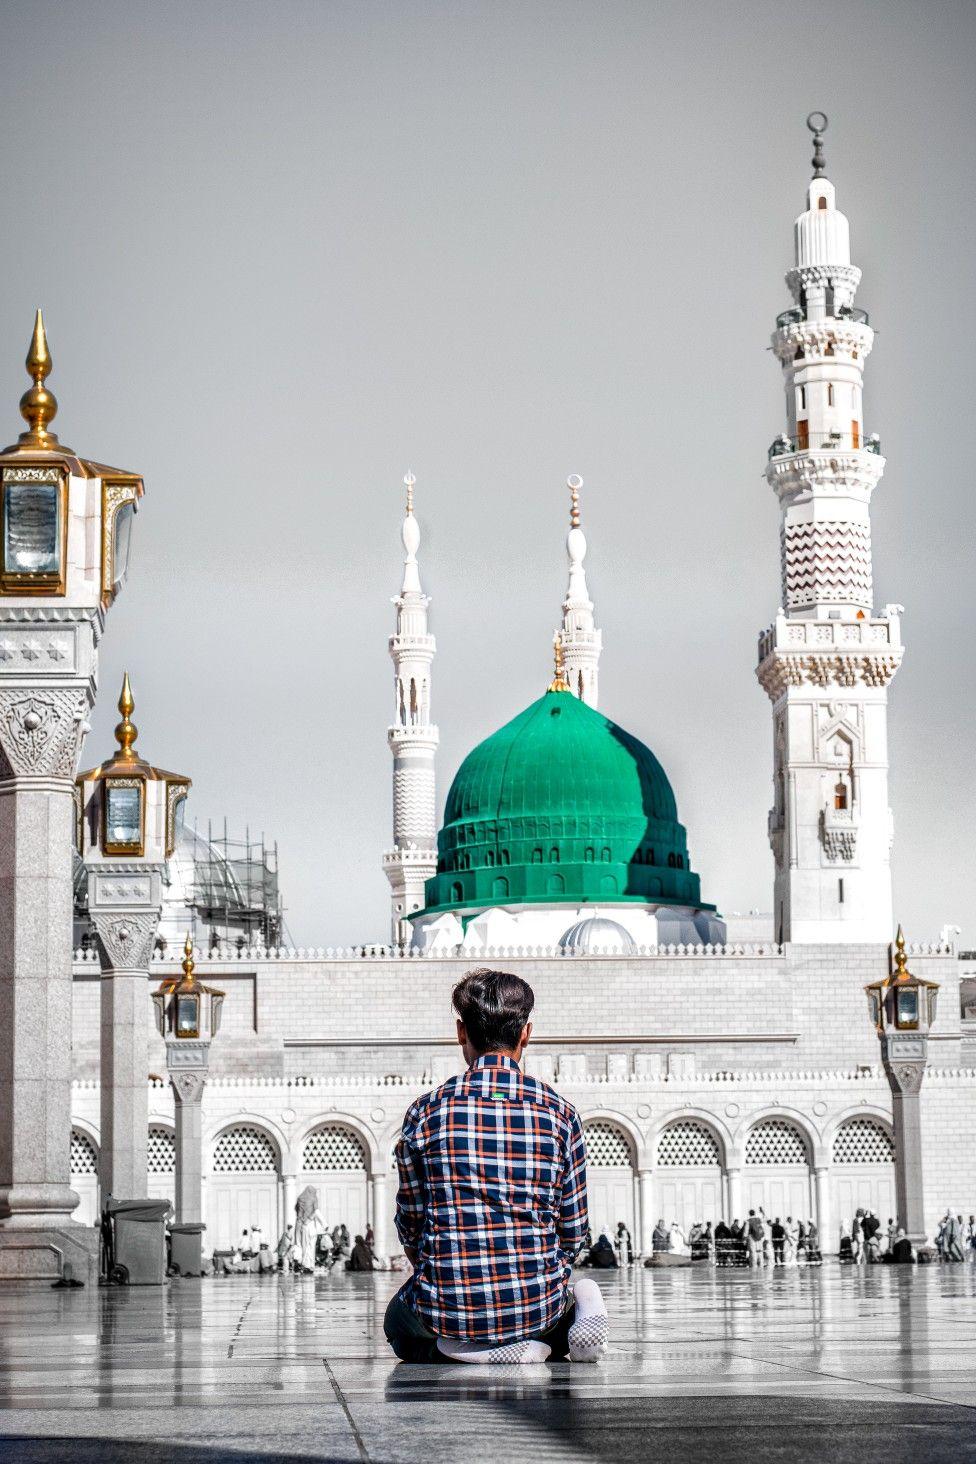 madina #nabi #masjid #mosque #color #buildings #urban #mecca #street